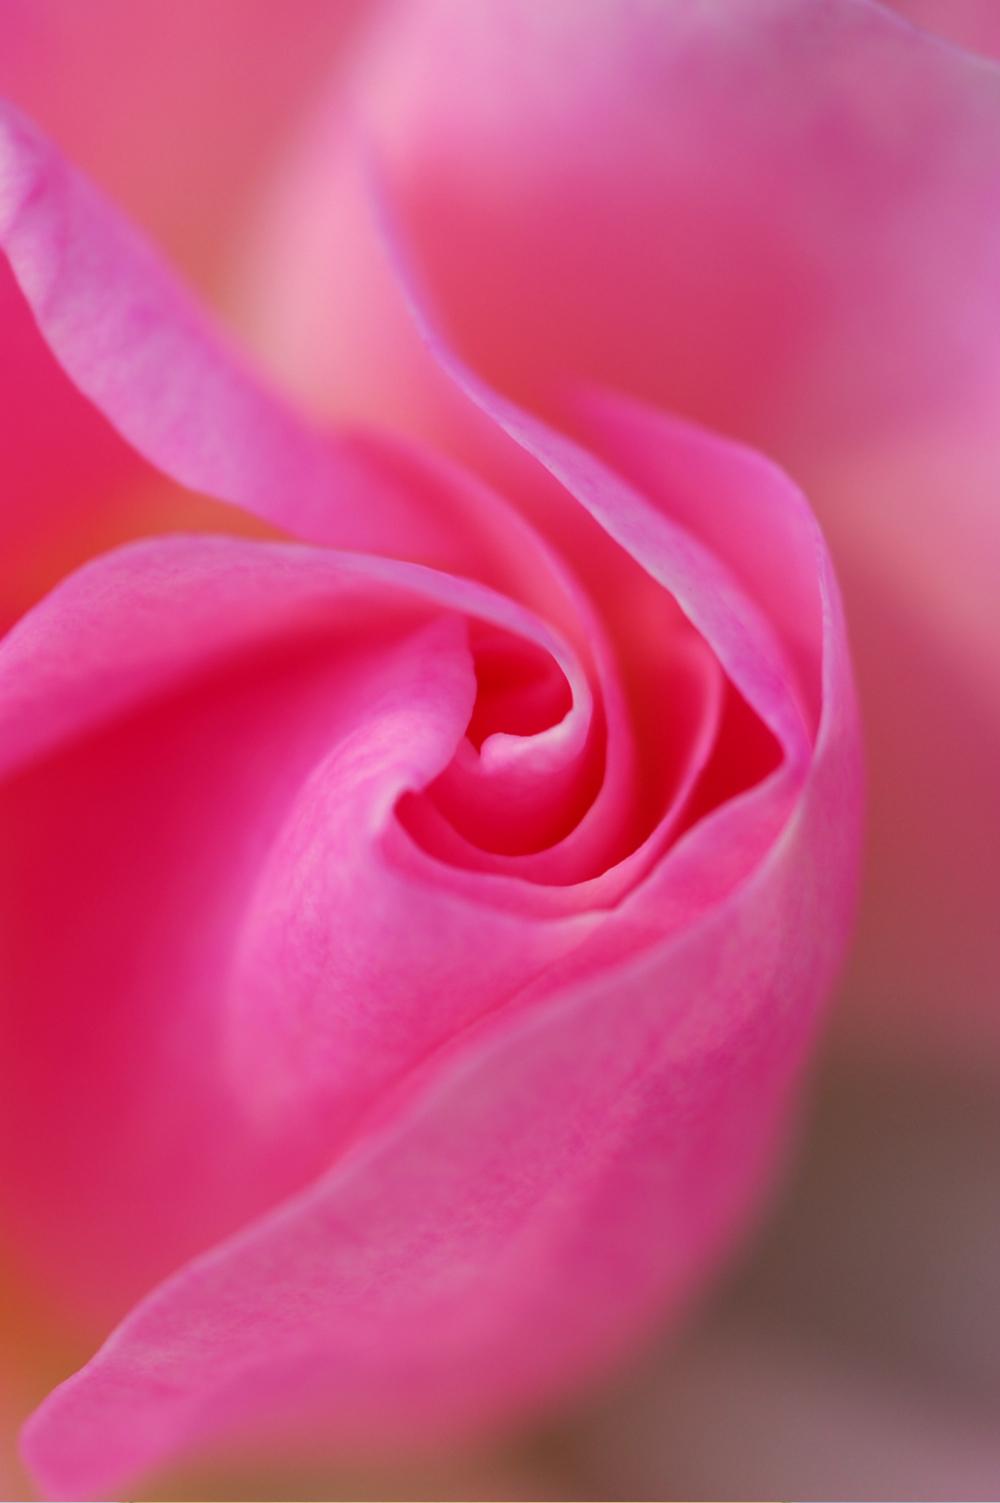 rosewater_moisturizer